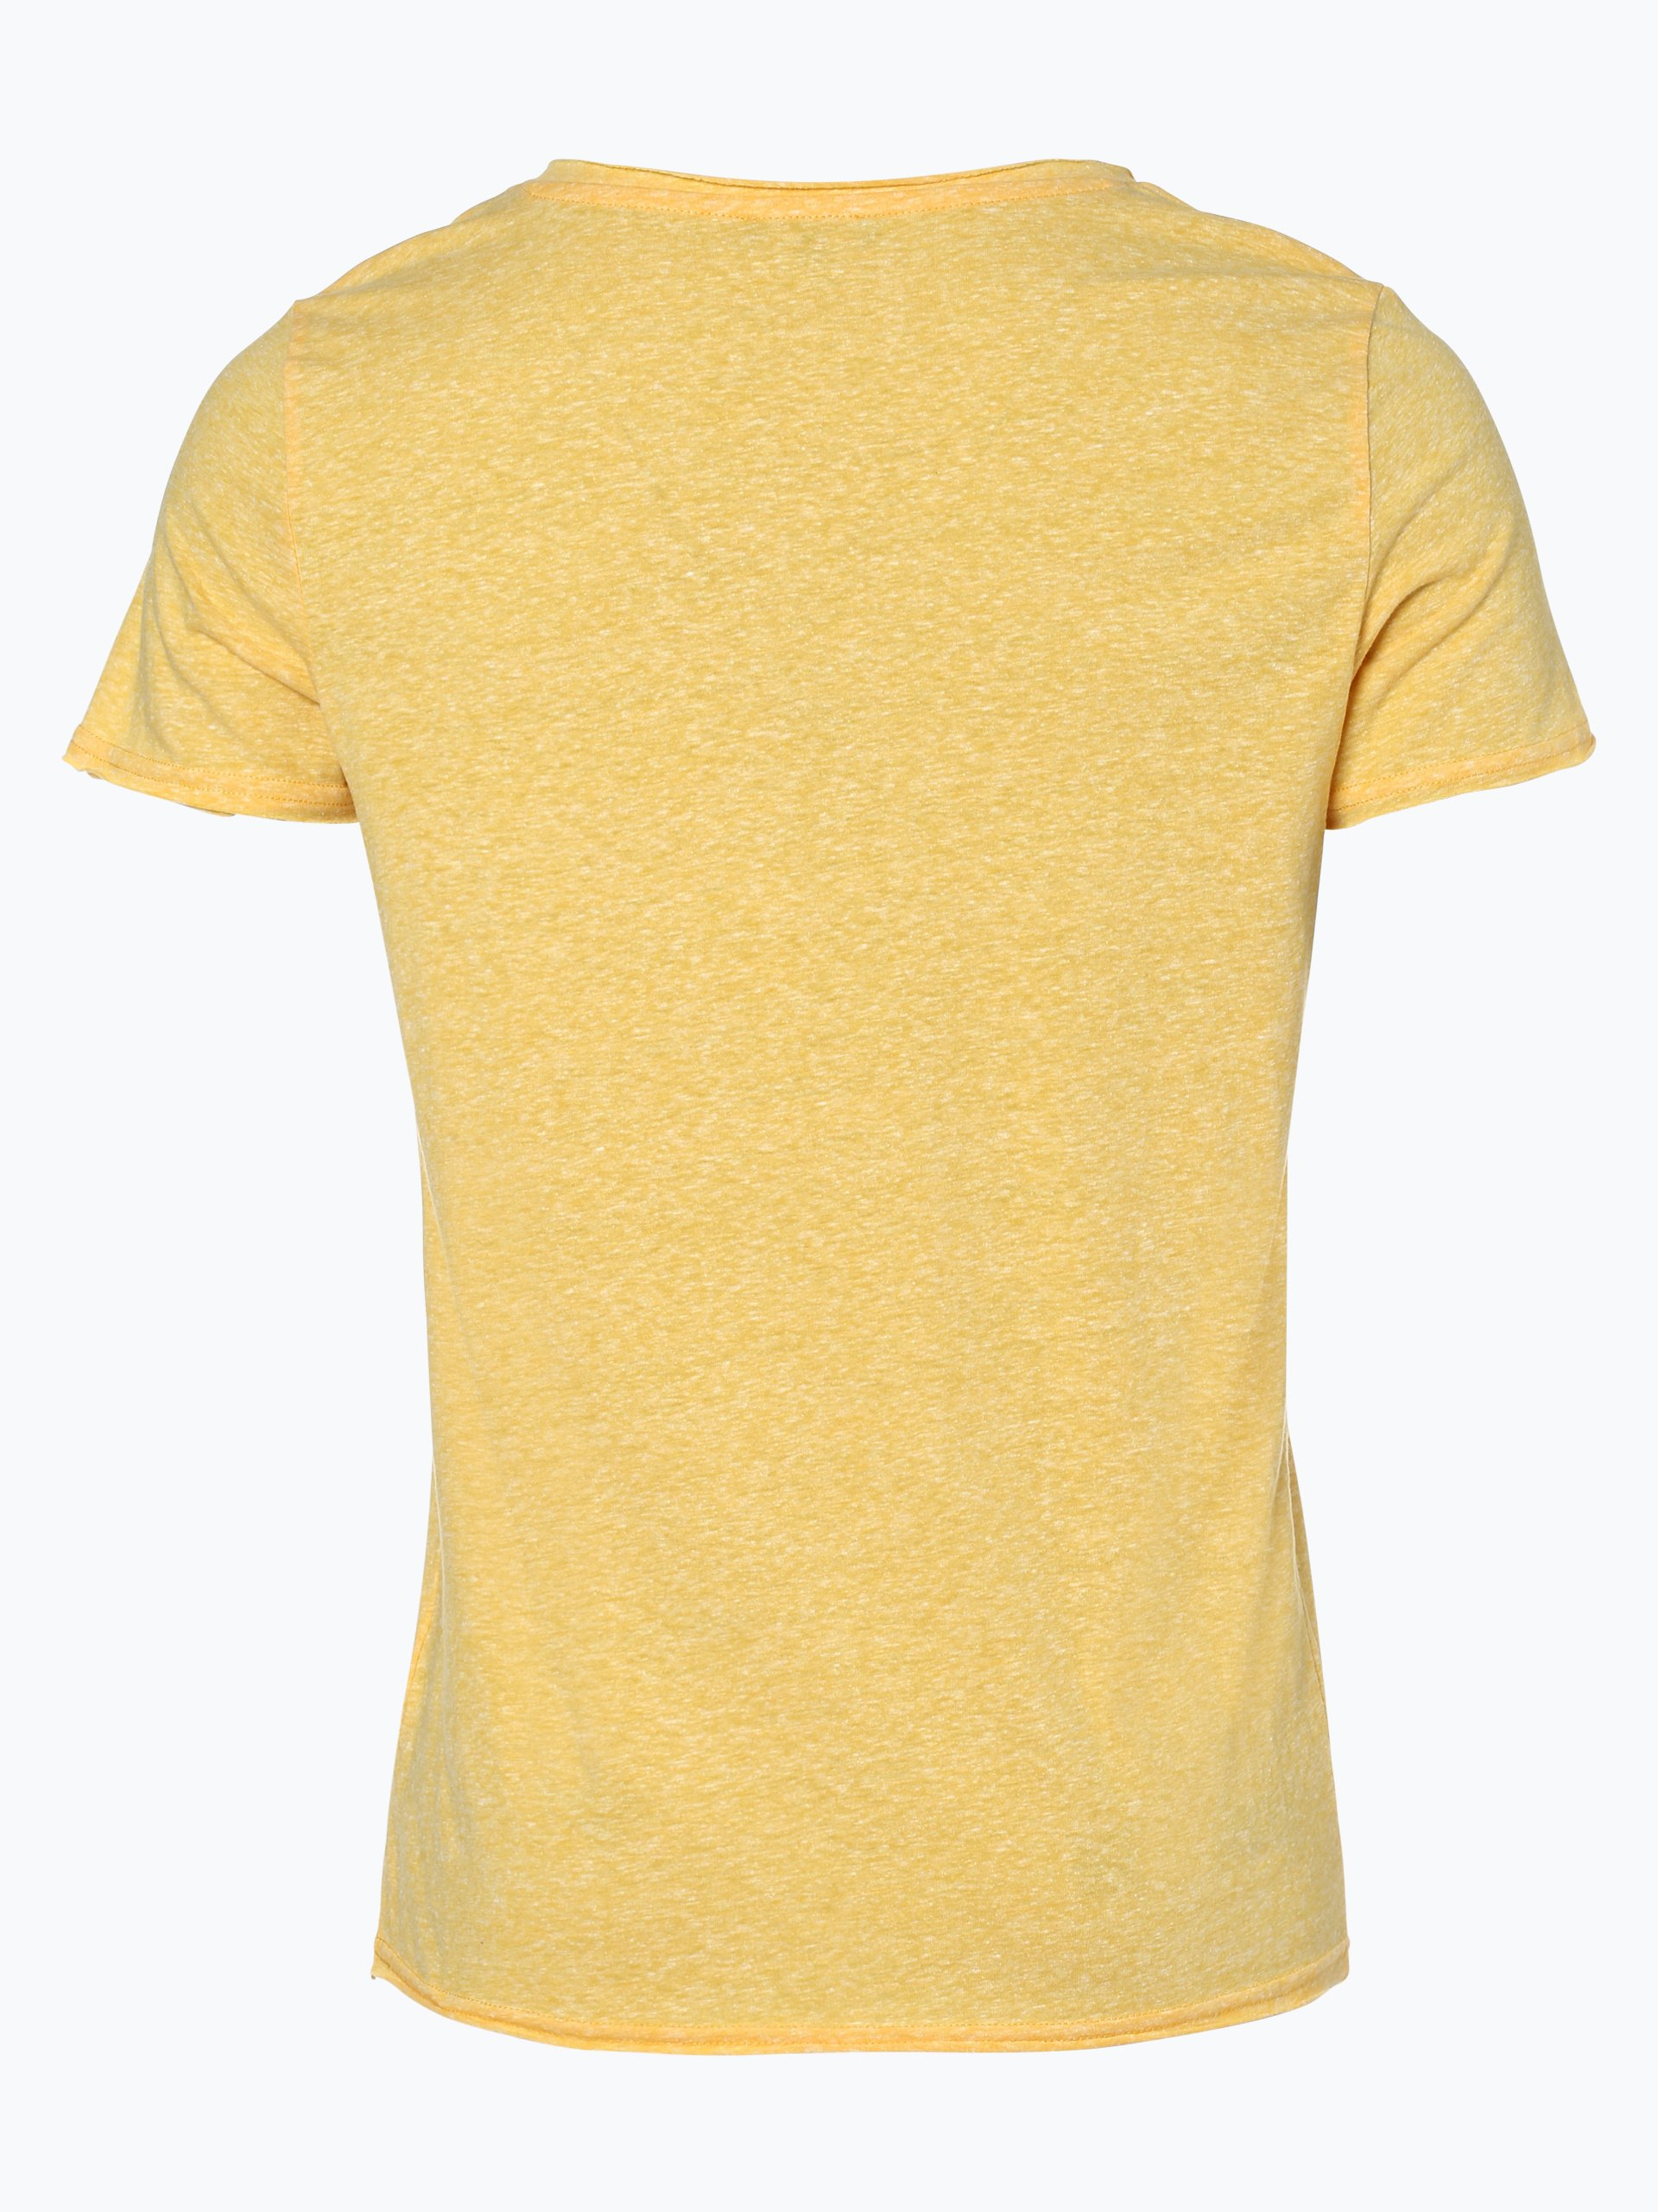 review herren t shirt gelb uni online kaufen vangraaf com. Black Bedroom Furniture Sets. Home Design Ideas